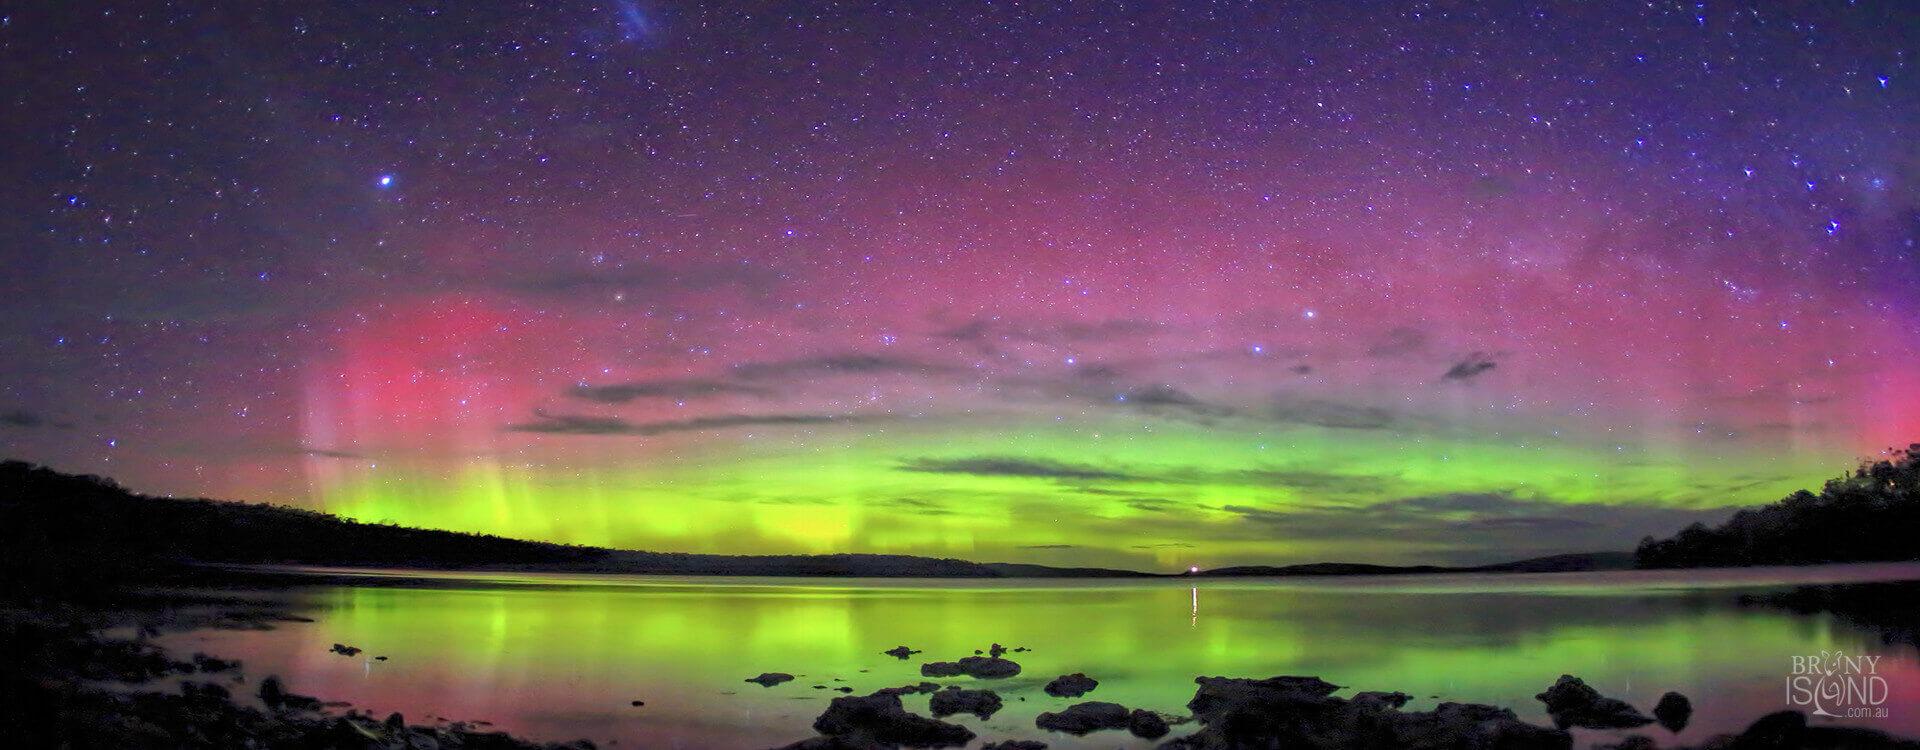 Bruny Island Tasmania - BrunyIsland.au Photography